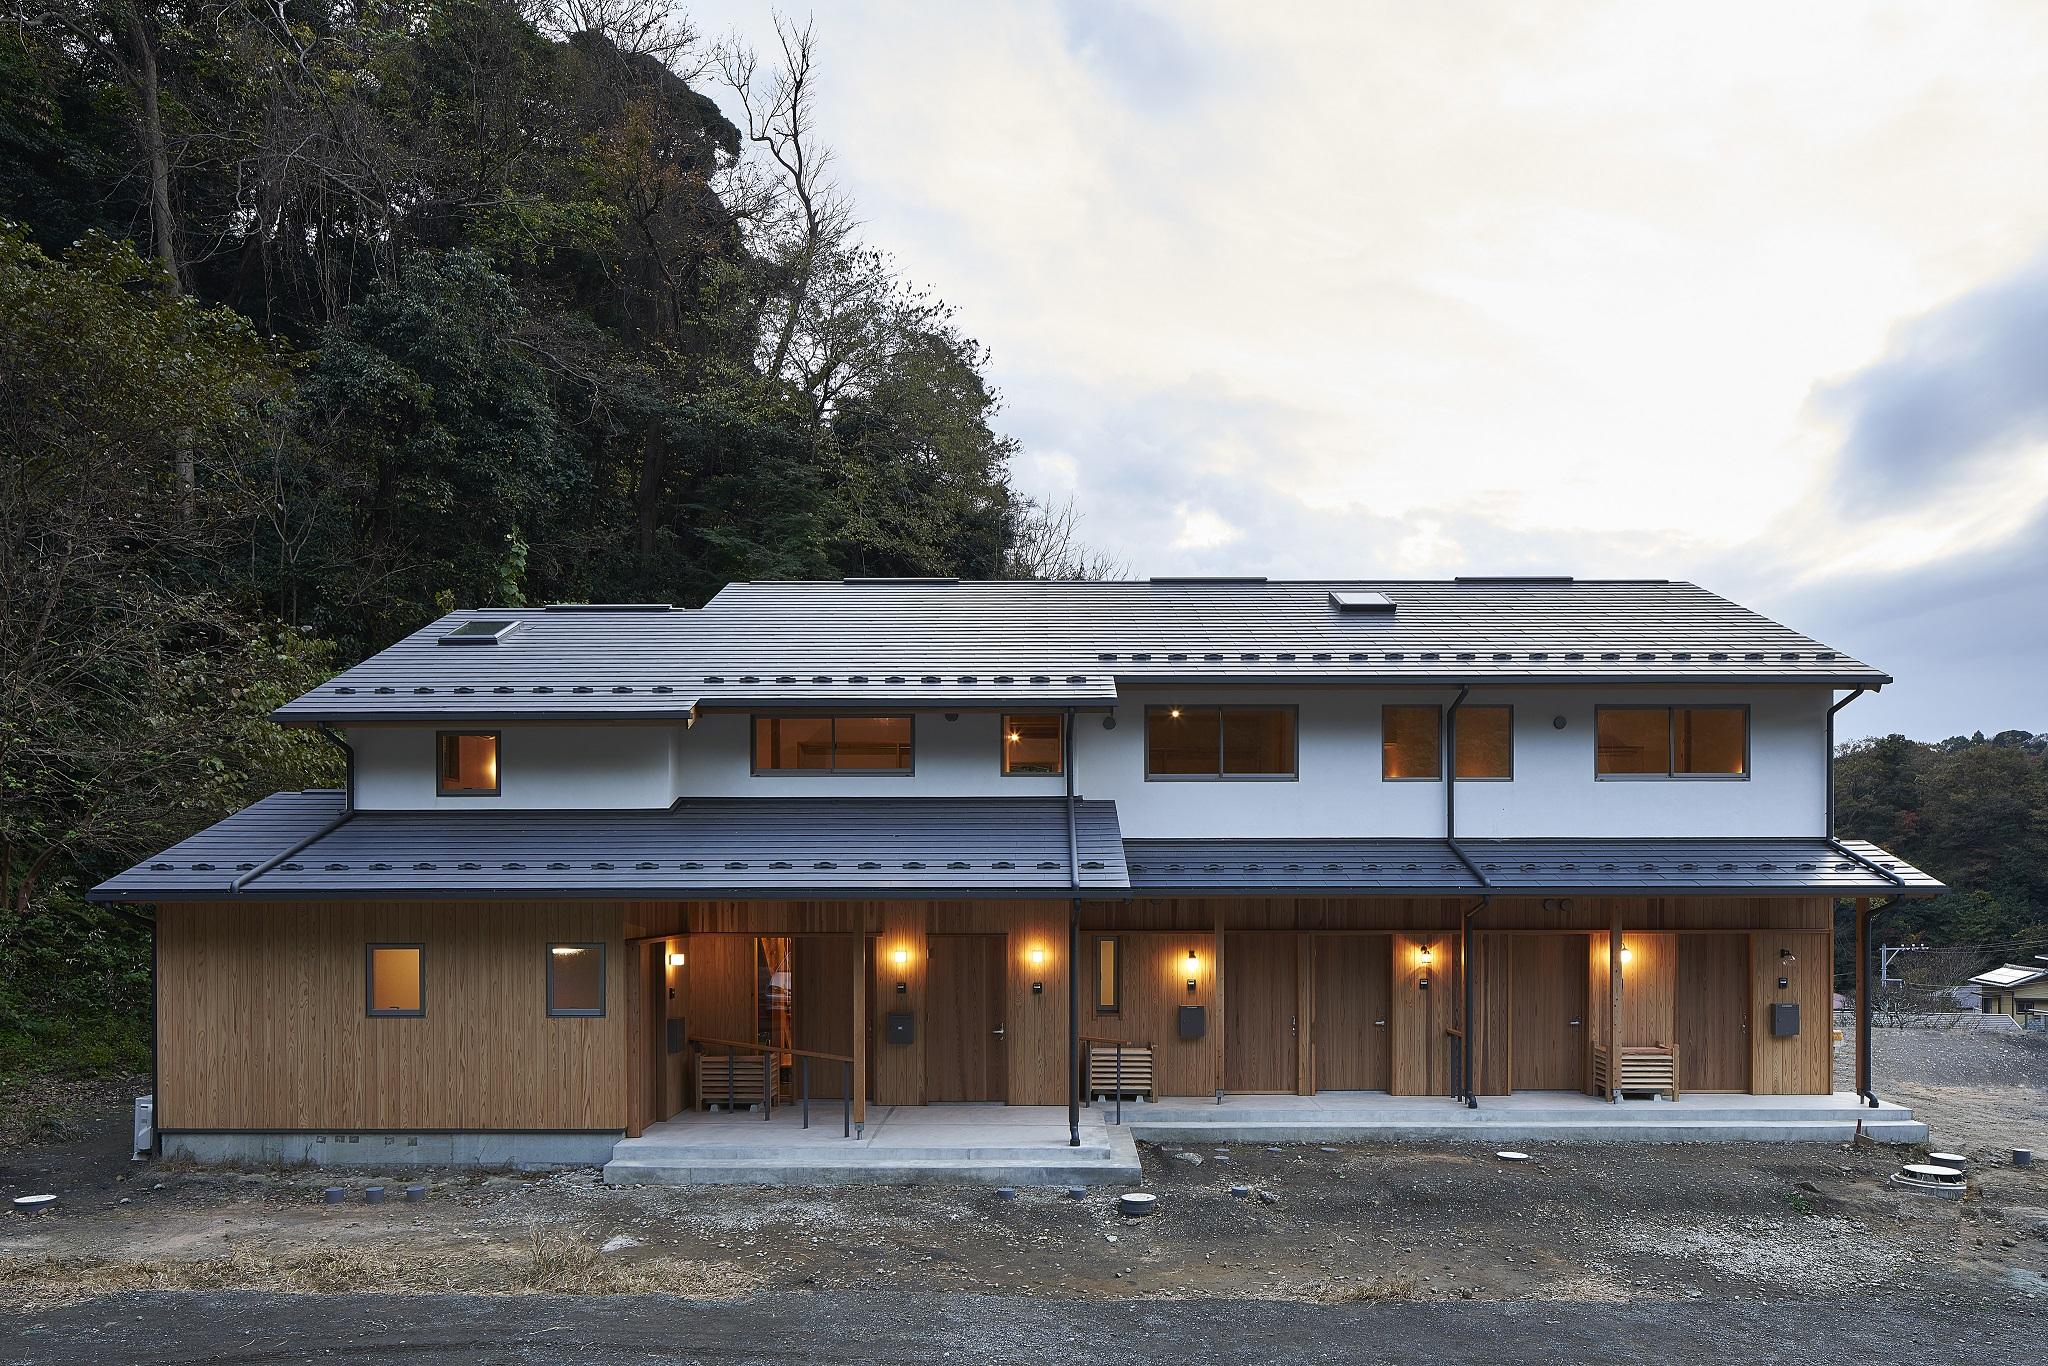 鎌倉の長屋 kamakura_kanagawa 神奈川 ©角悠一郎